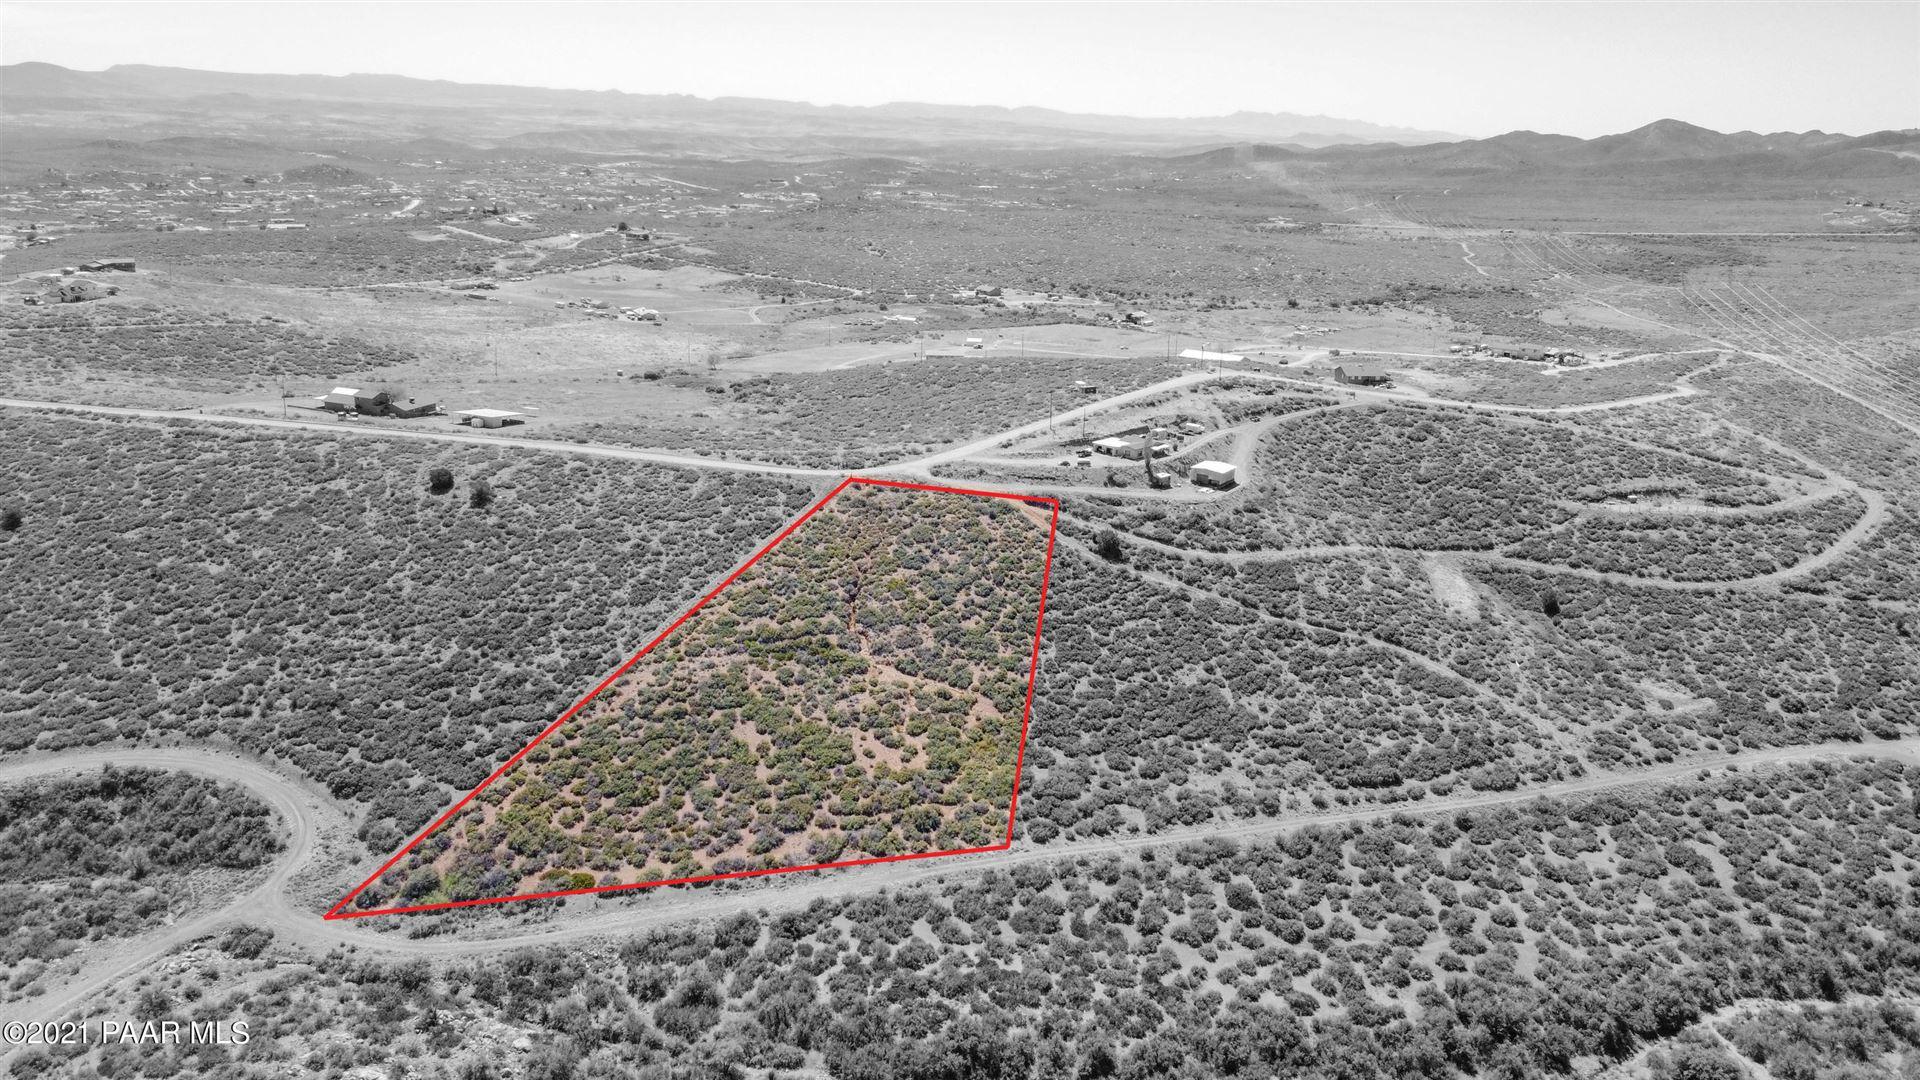 Photo of 0 Rabbit Ridge - 402-15-014m #Lot: 014M, Dewey-Humboldt, AZ 86327 (MLS # 1037674)